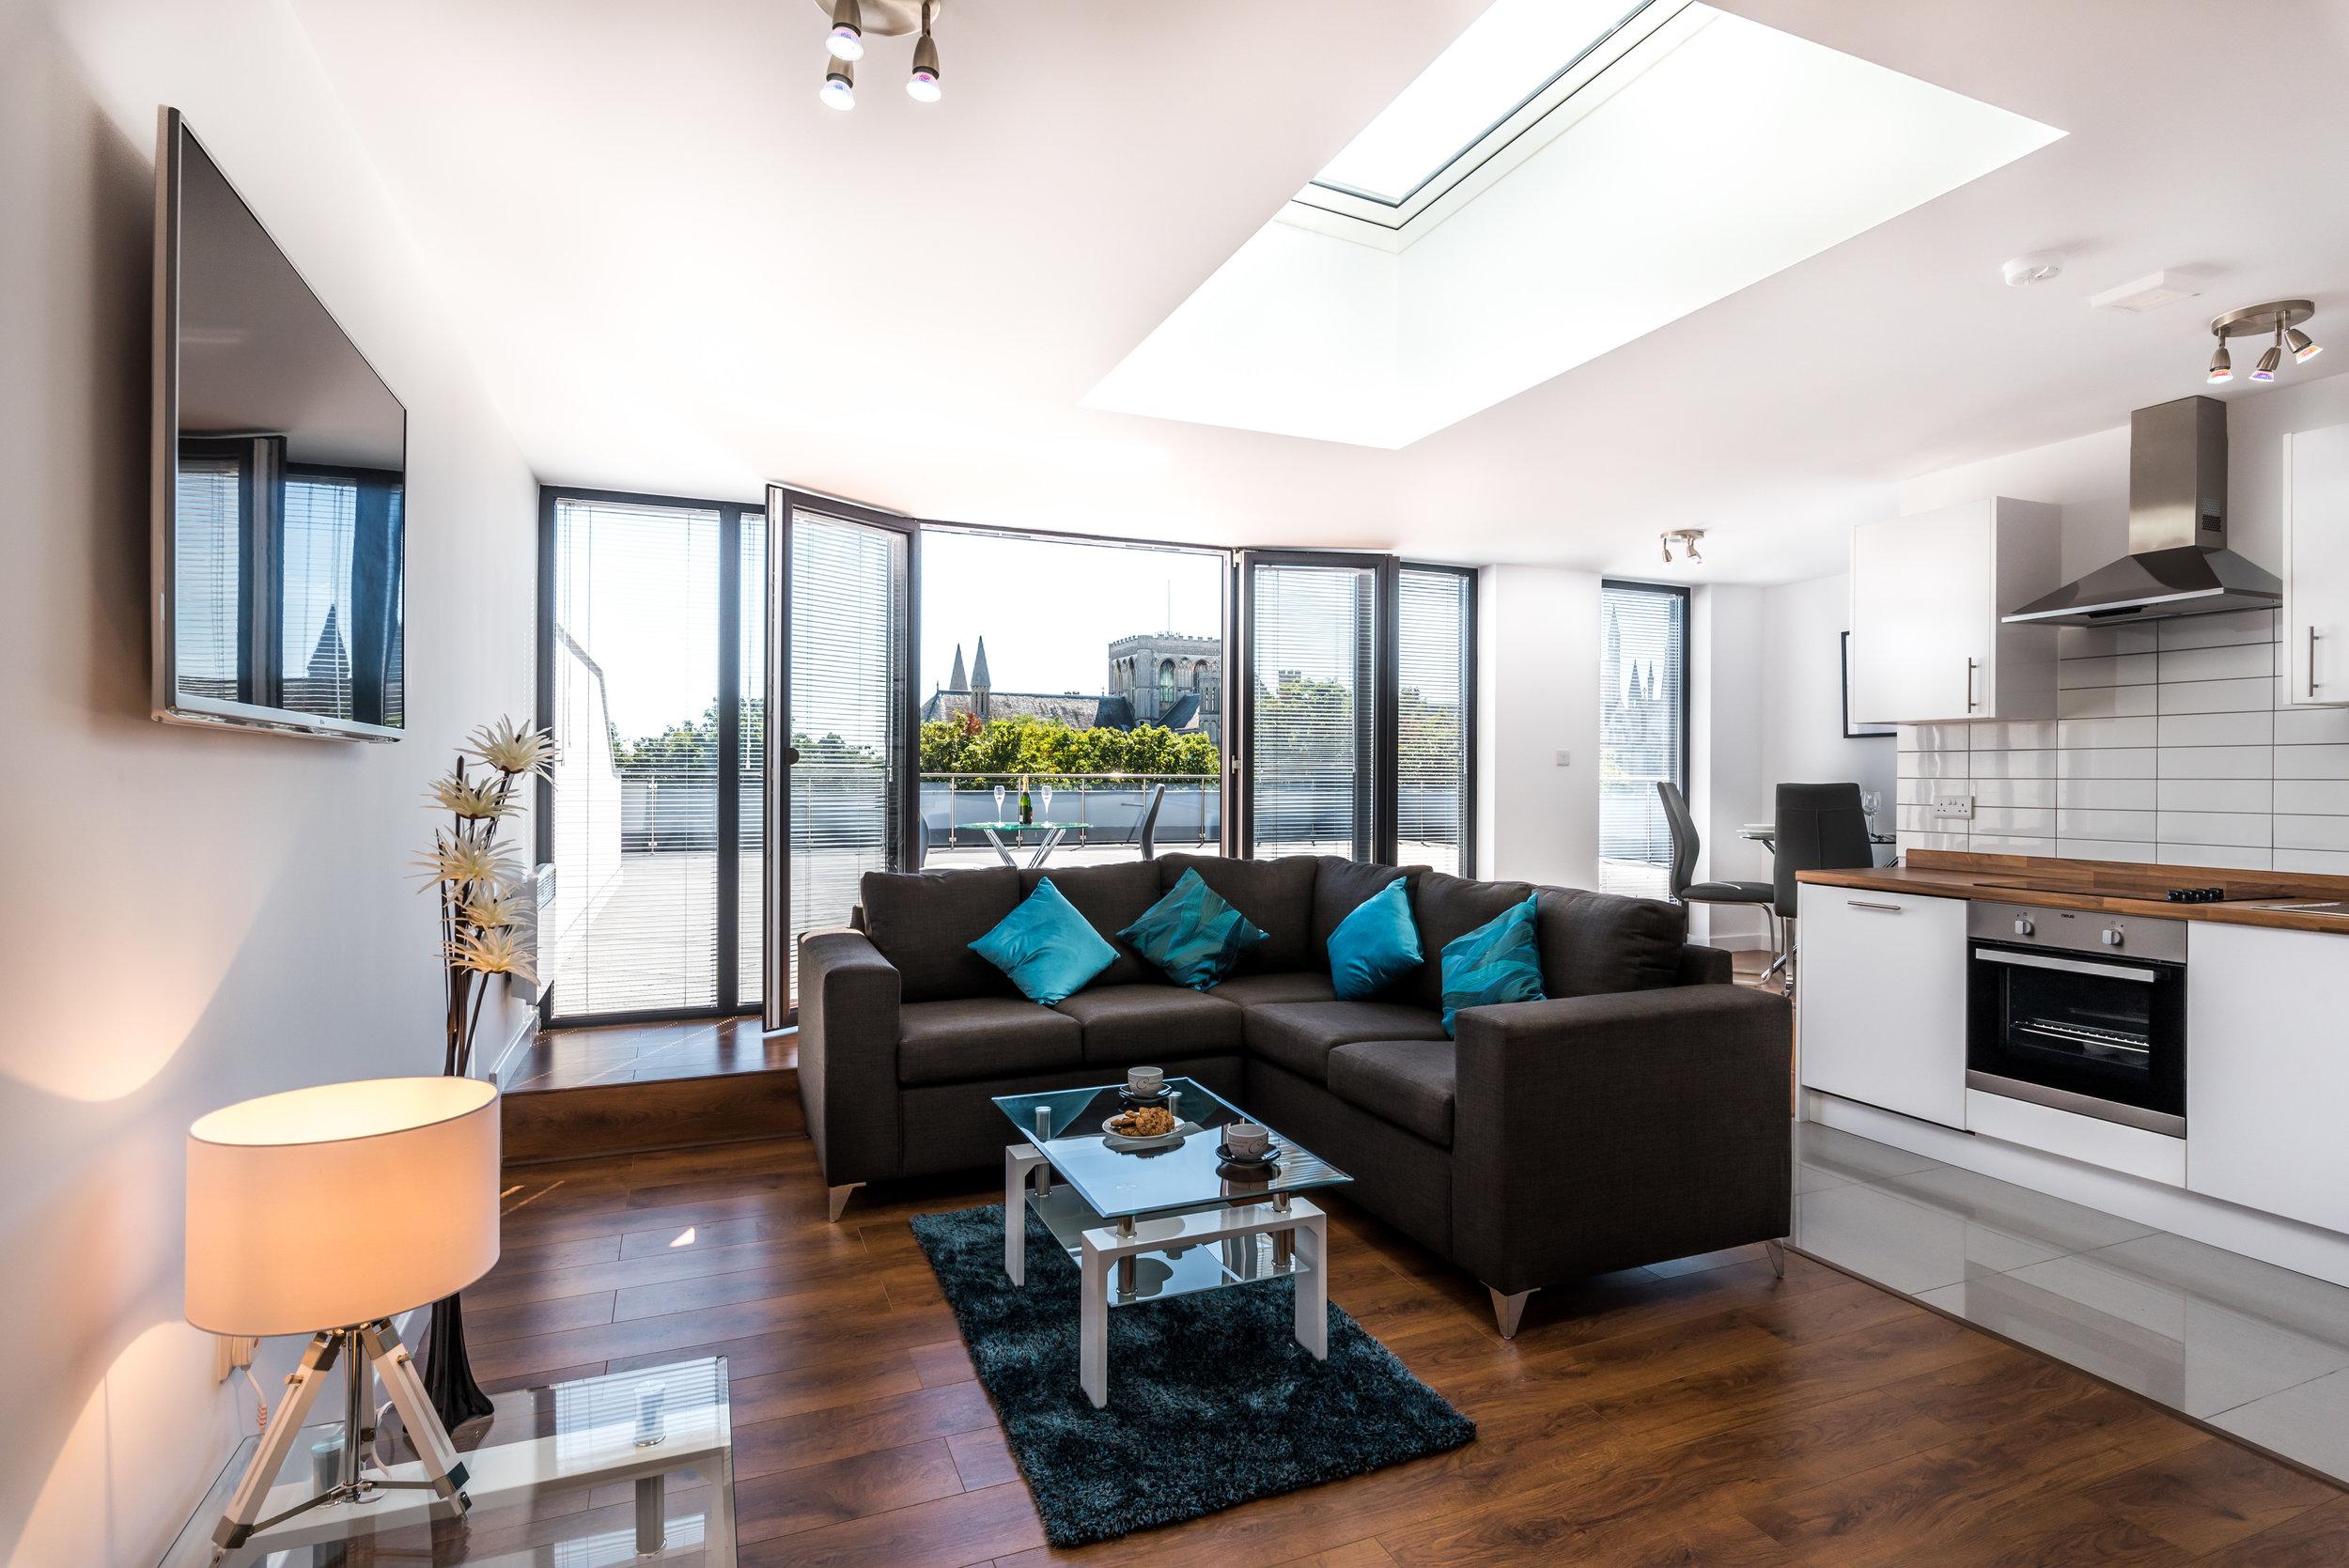 Penthouse apartment in Peterborough